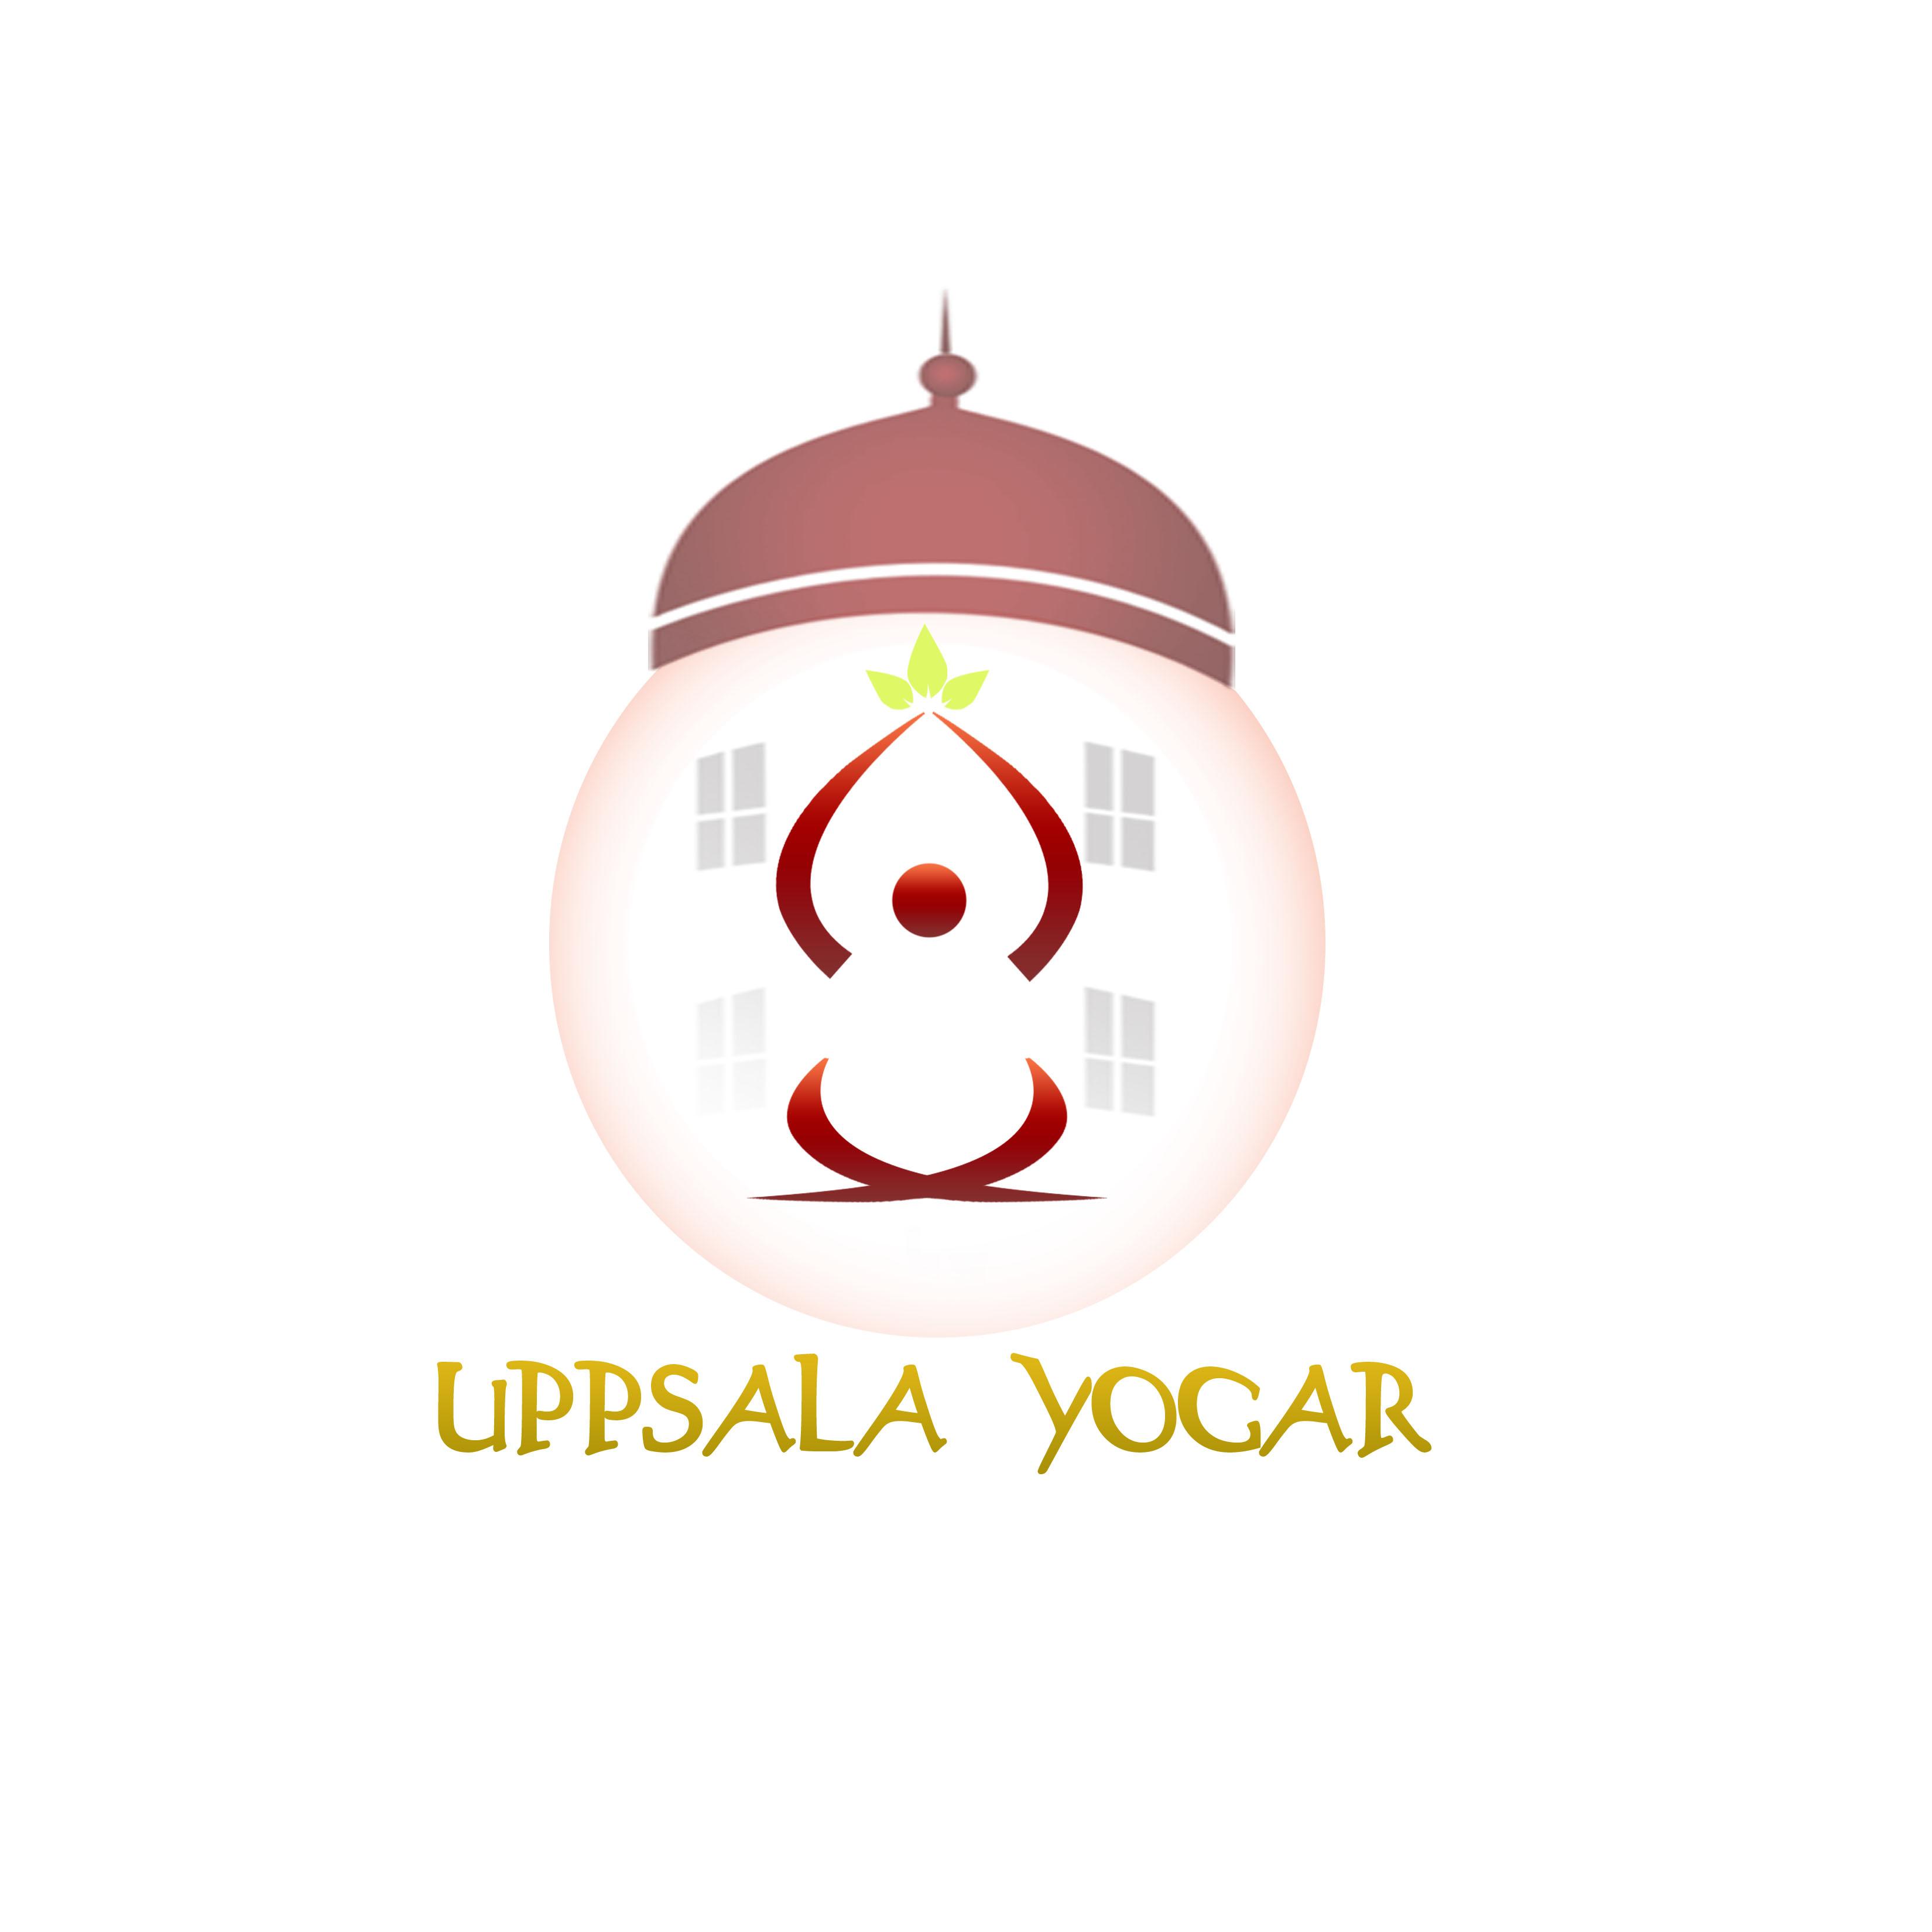 Logo Design by Allan Esclamado - Entry No. 10 in the Logo Design Contest Unique Logo Design Wanted for Uppsala Yogar.